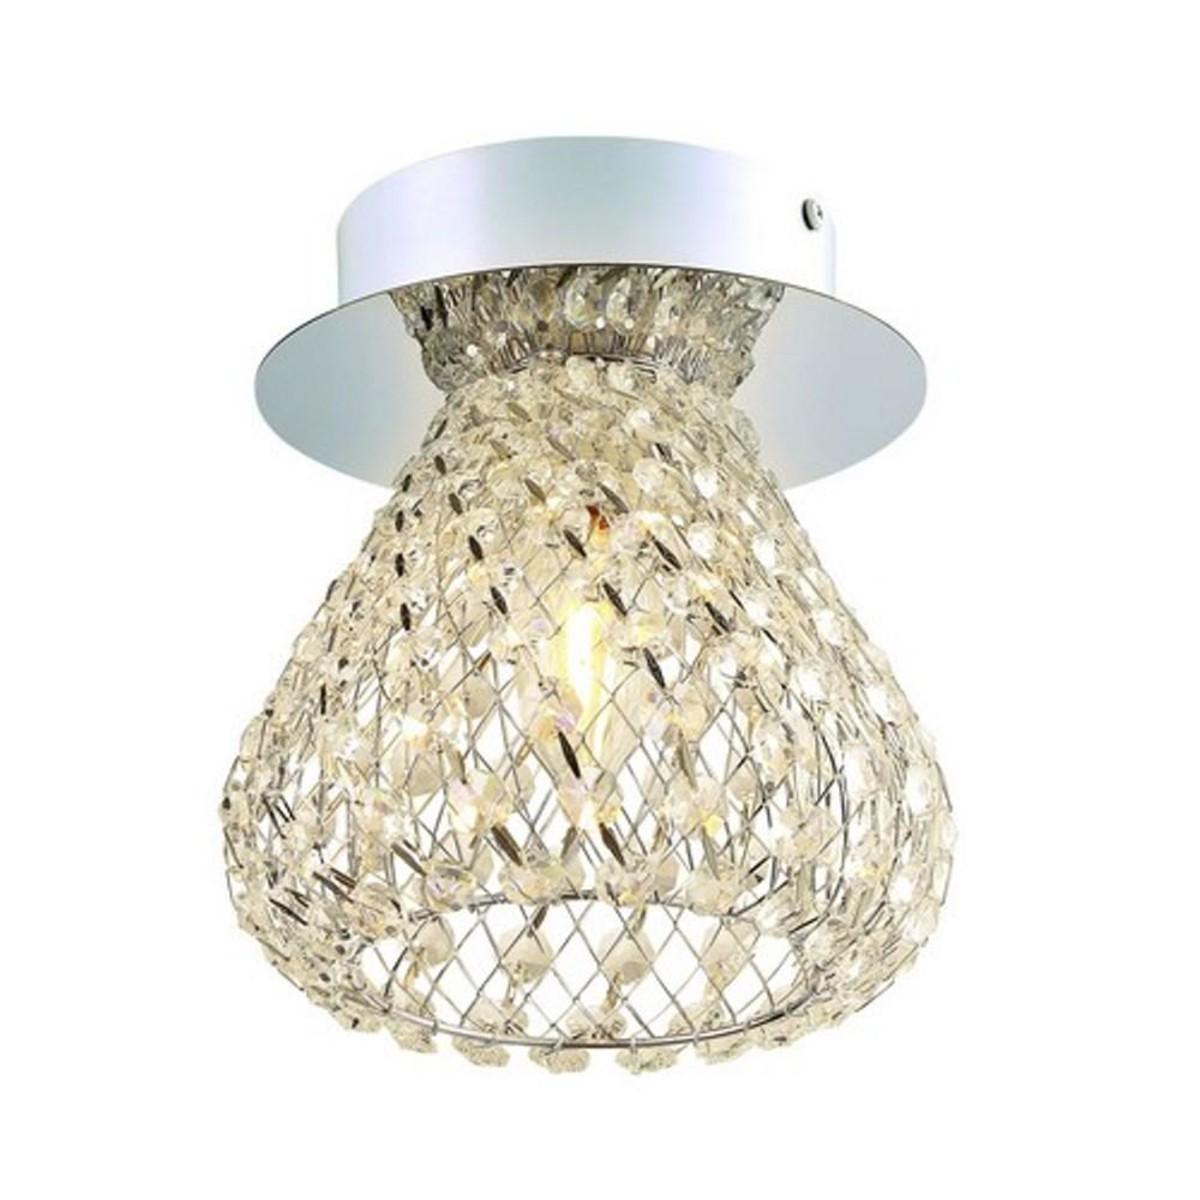 Люстра Arte Lamp Adamello A9466PL-1CC E14 1 лампа